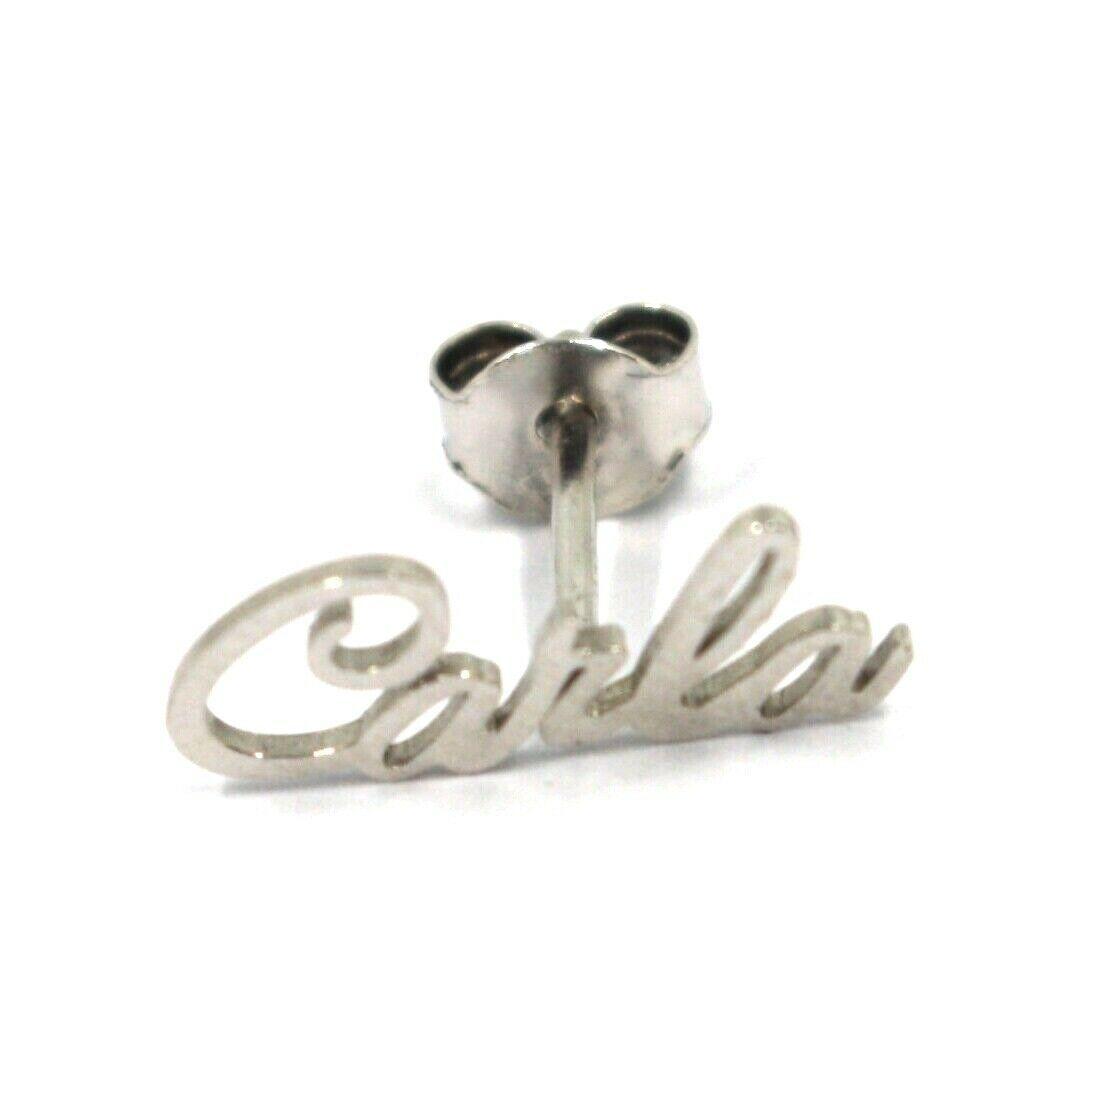 925 STERLING SILVER EARRINGS, WRITTEN NAME CARLA, MADE IN ITALY